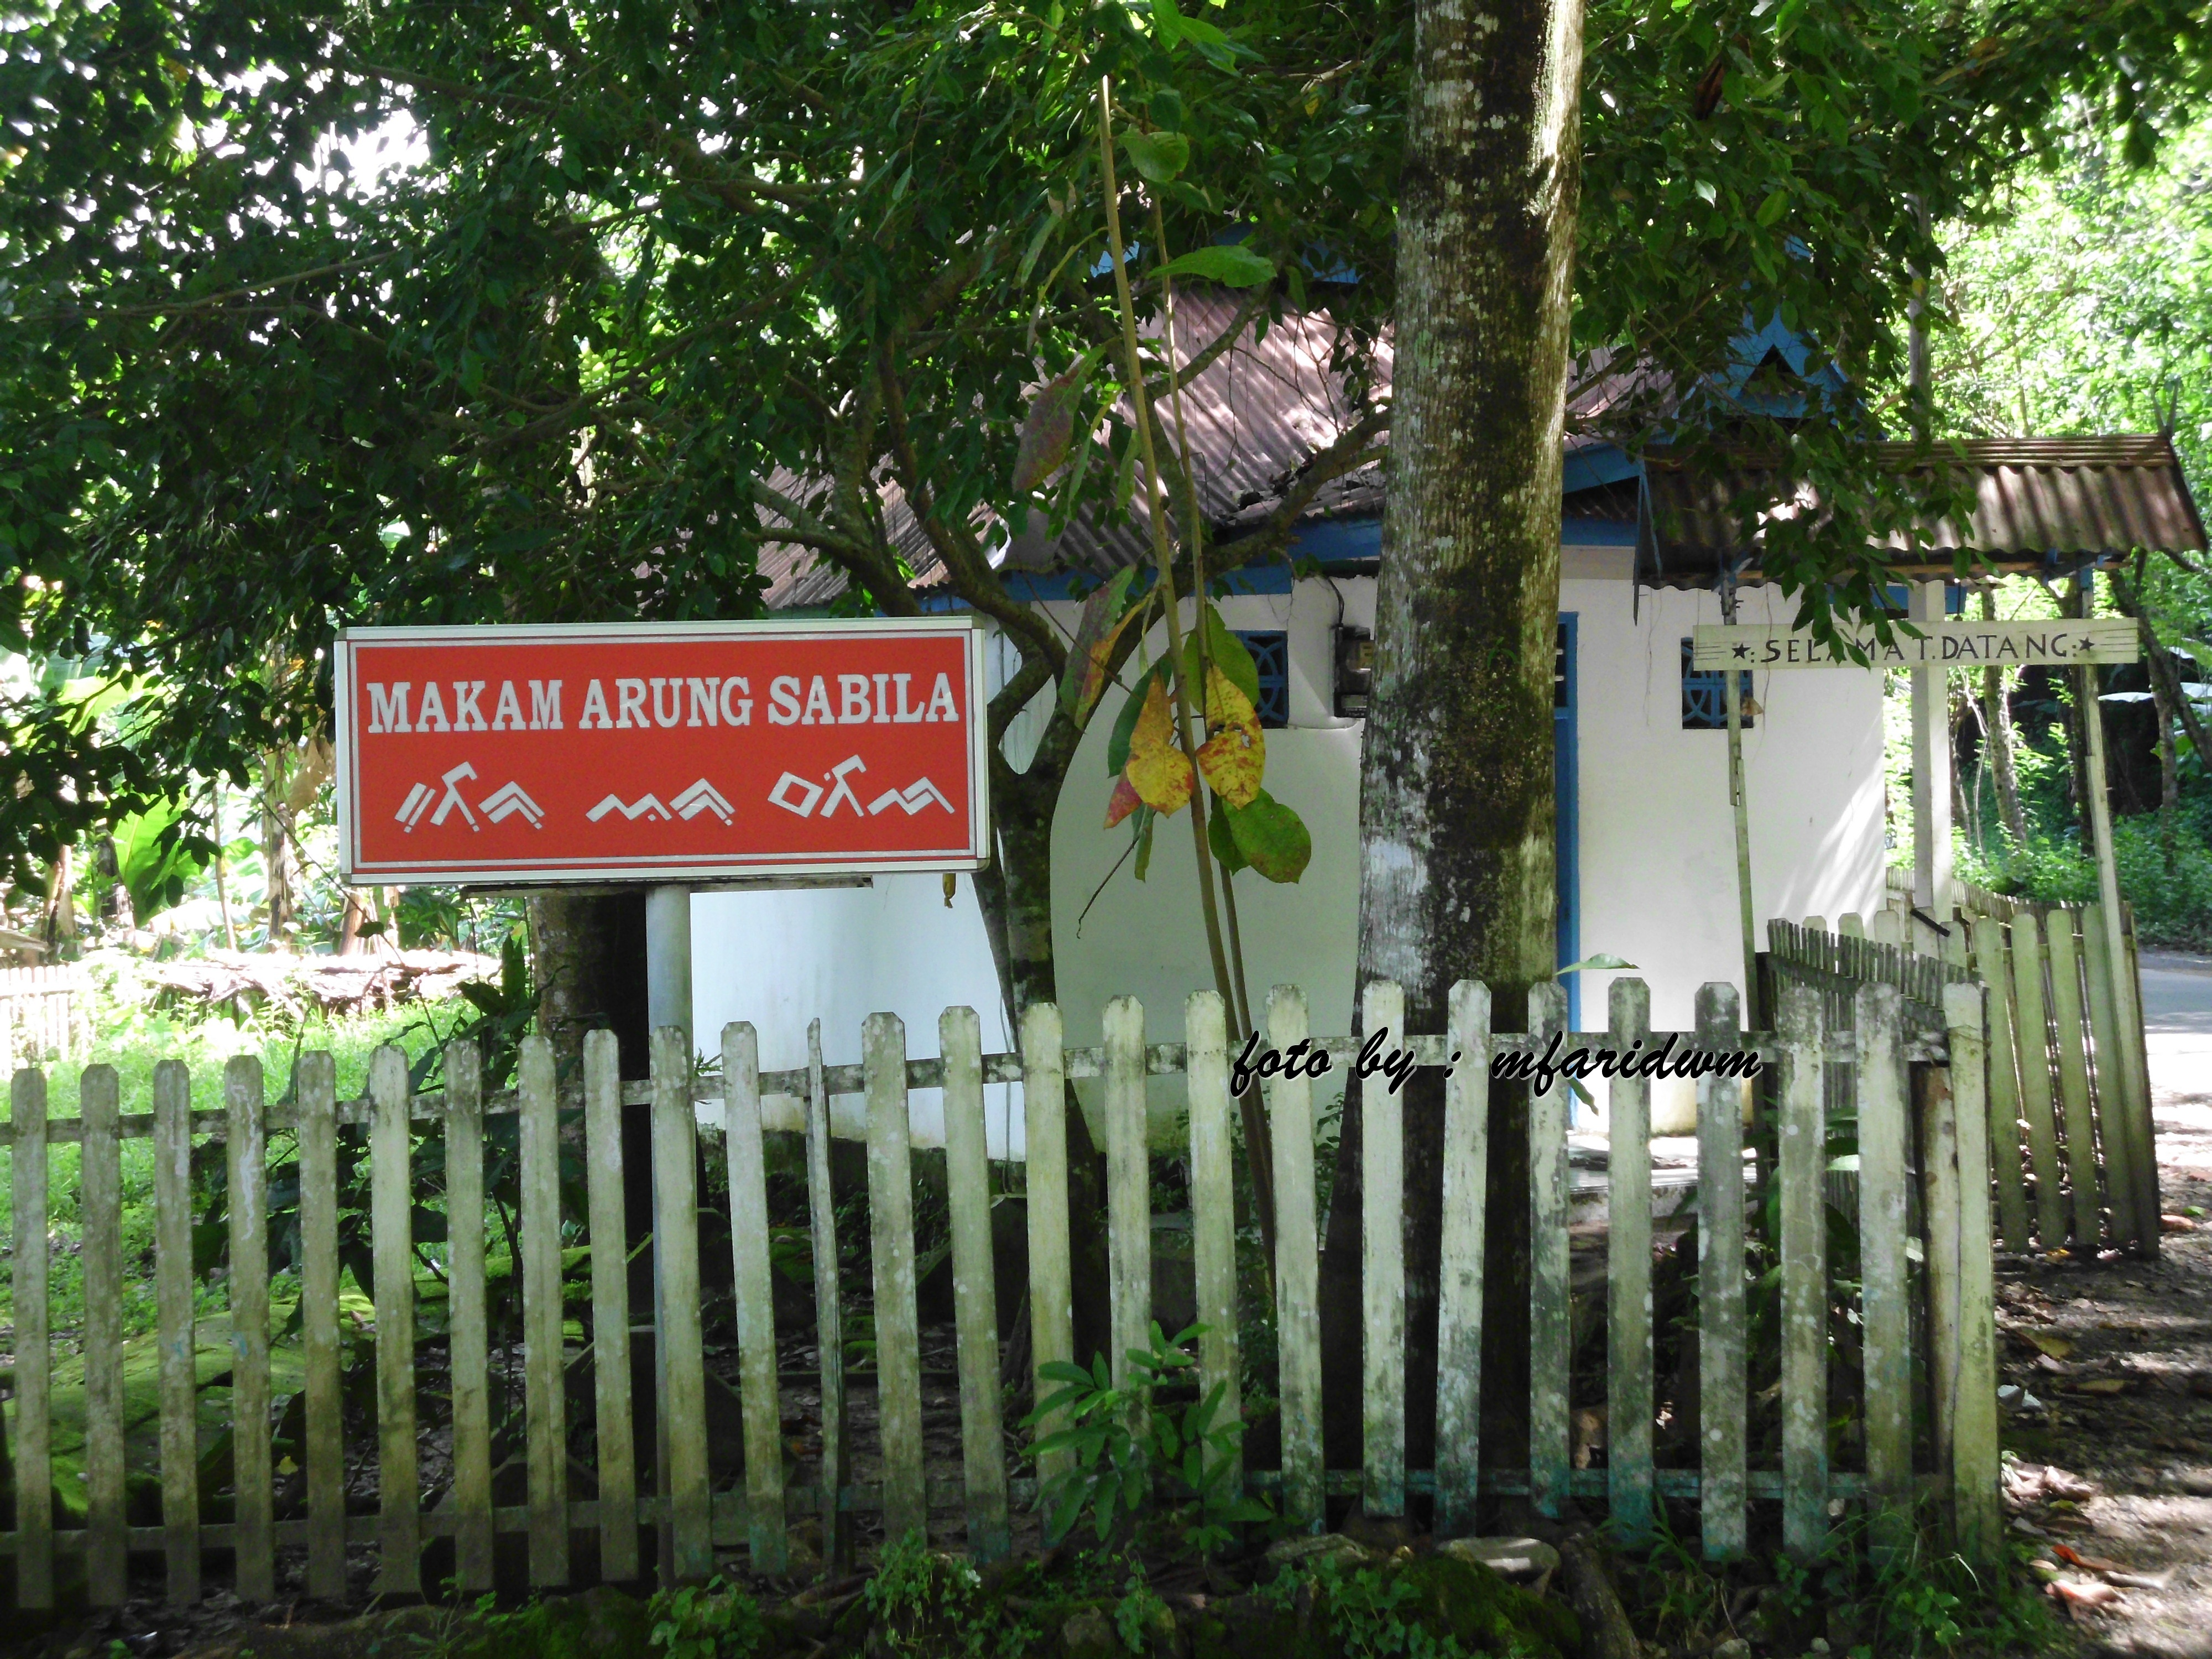 Makam Arung Sabila di Minasatene. (foto: mfaridwm/palontaraq)